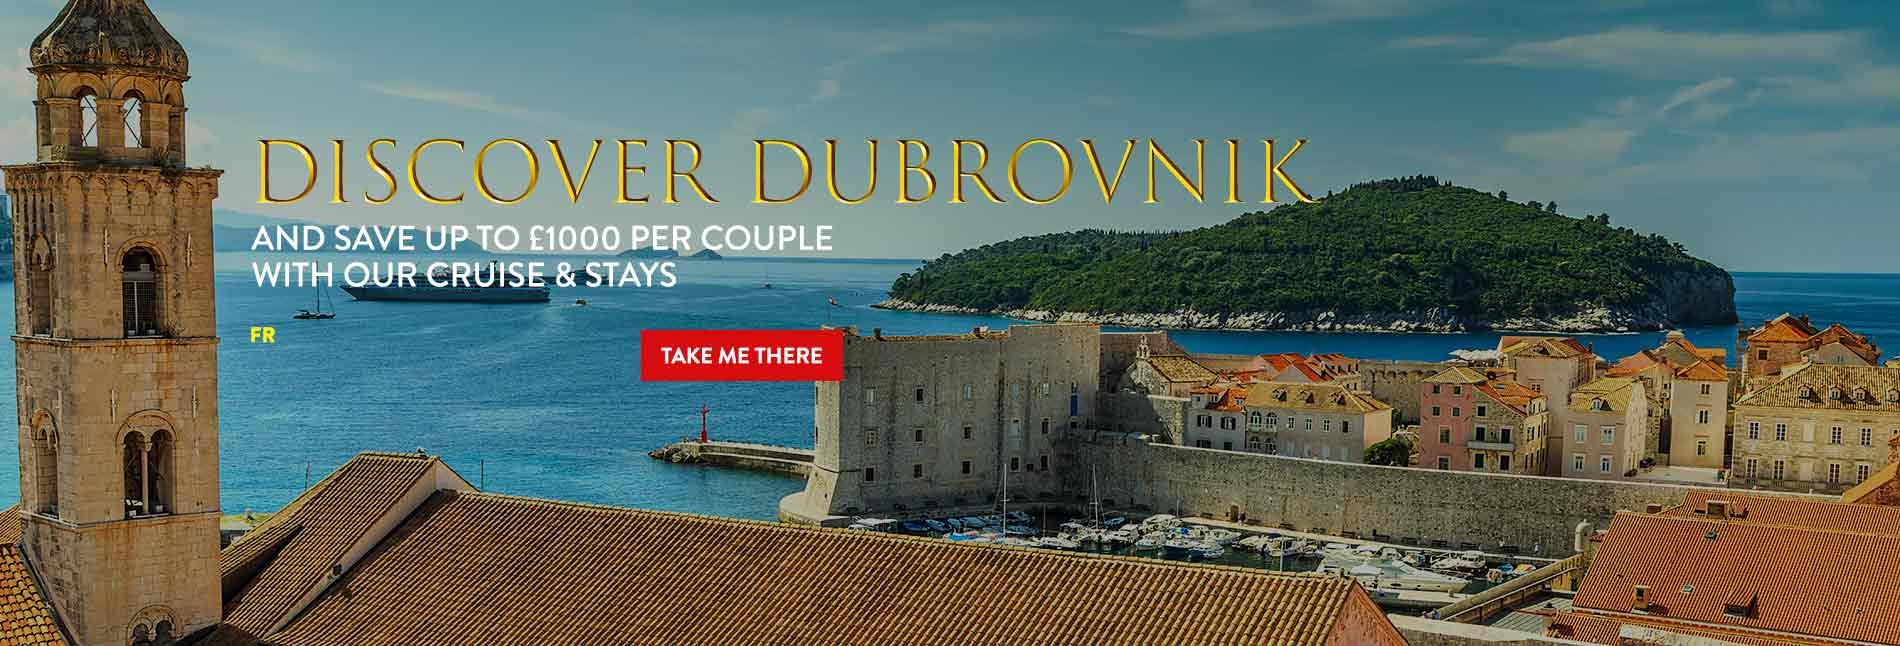 Dubrovnik Cruise Deals